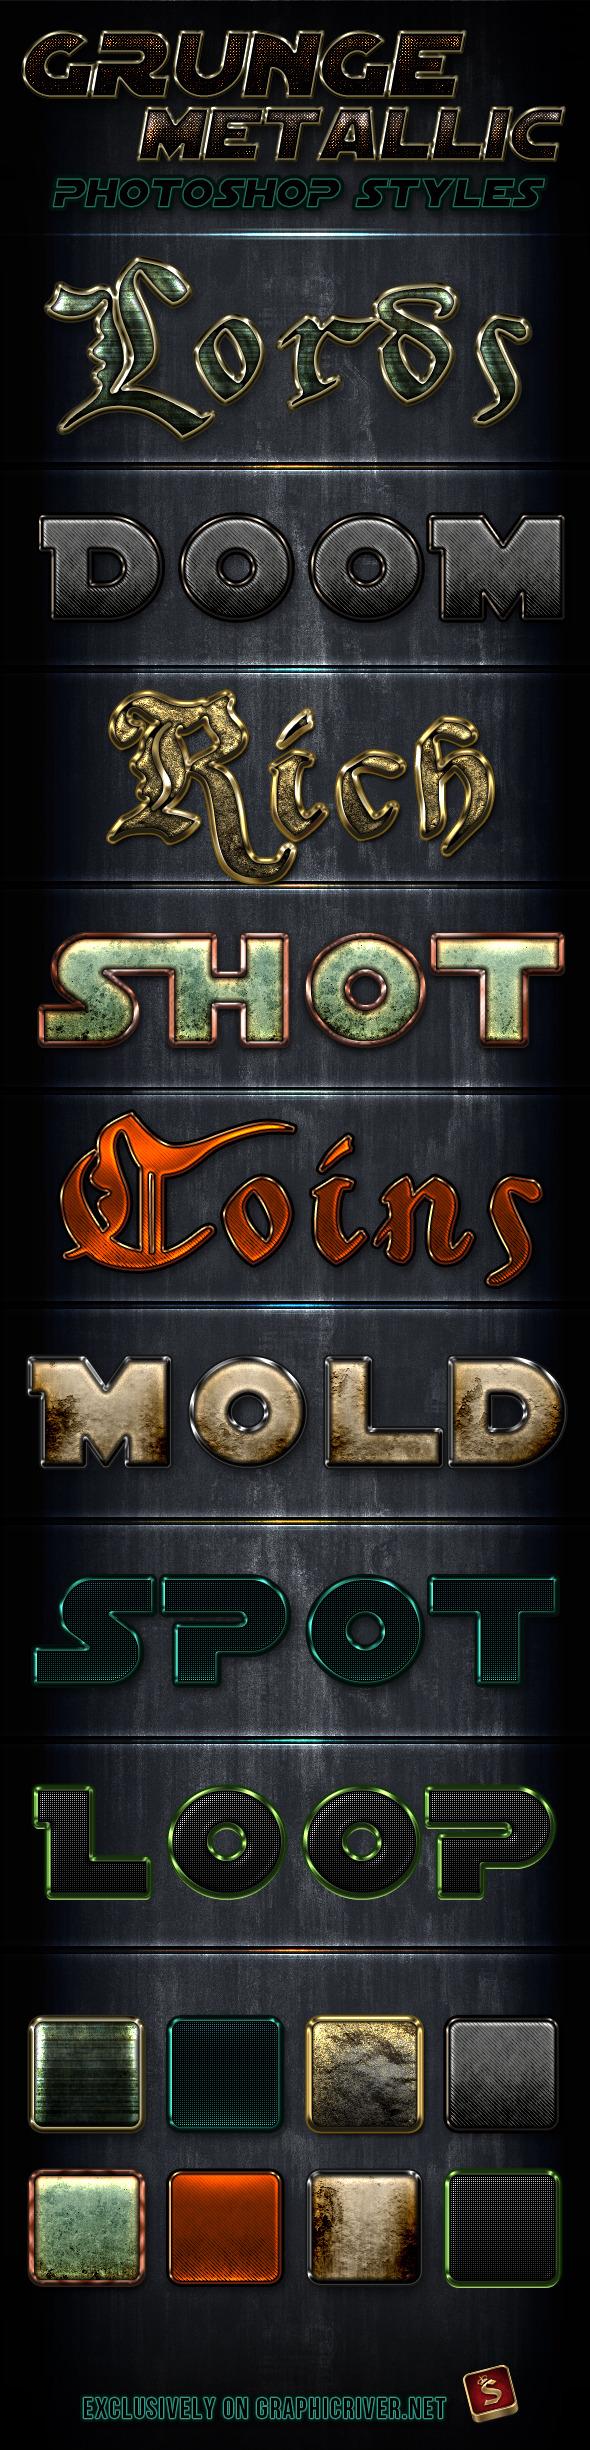 Metallic Grunge Photoshop Styles - Text Effects Styles